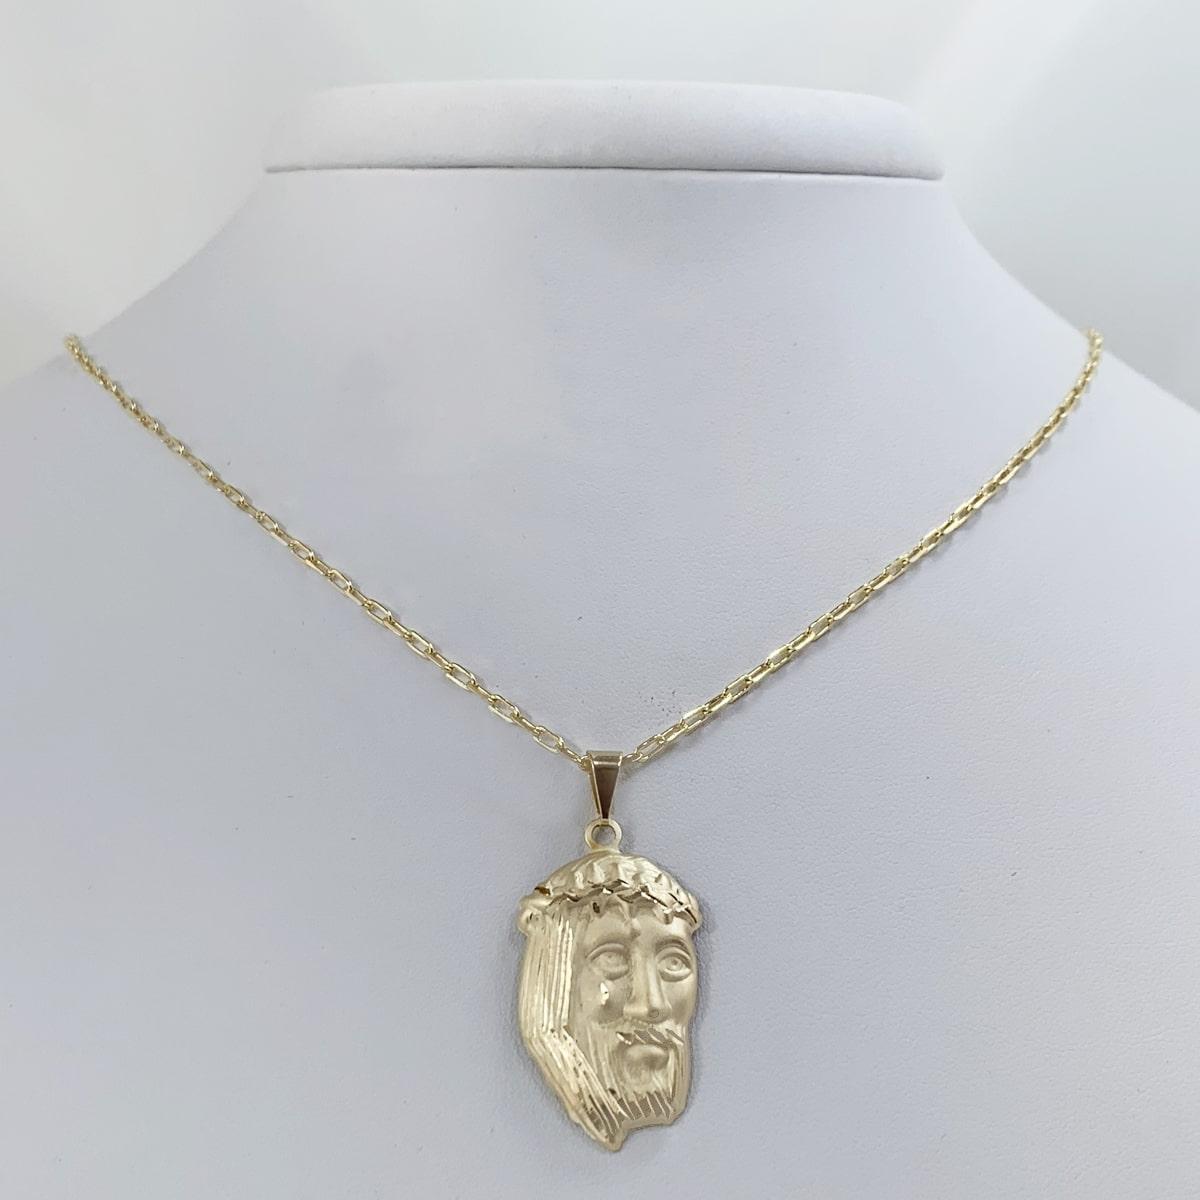 Corrente Cartier(Fina) com Face de Cristo Banhado a Ouro